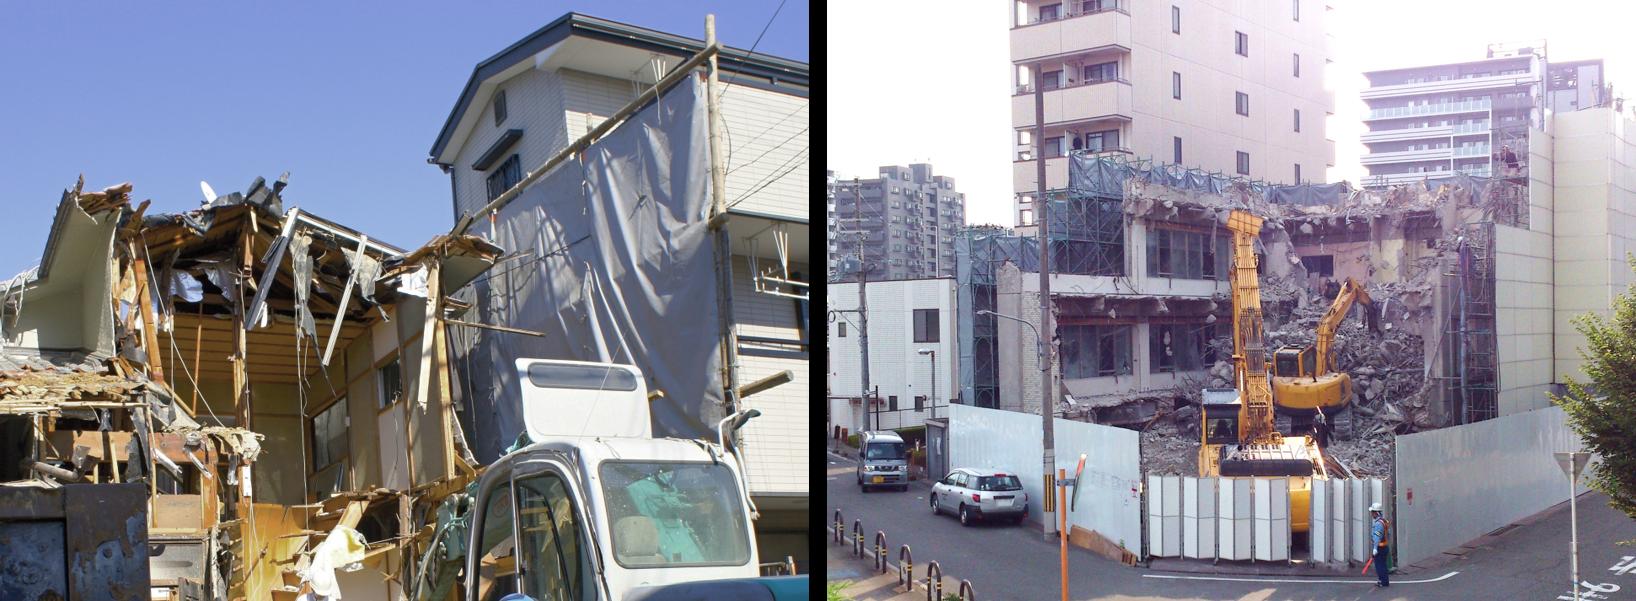 住宅・住居・事務所の解体工事